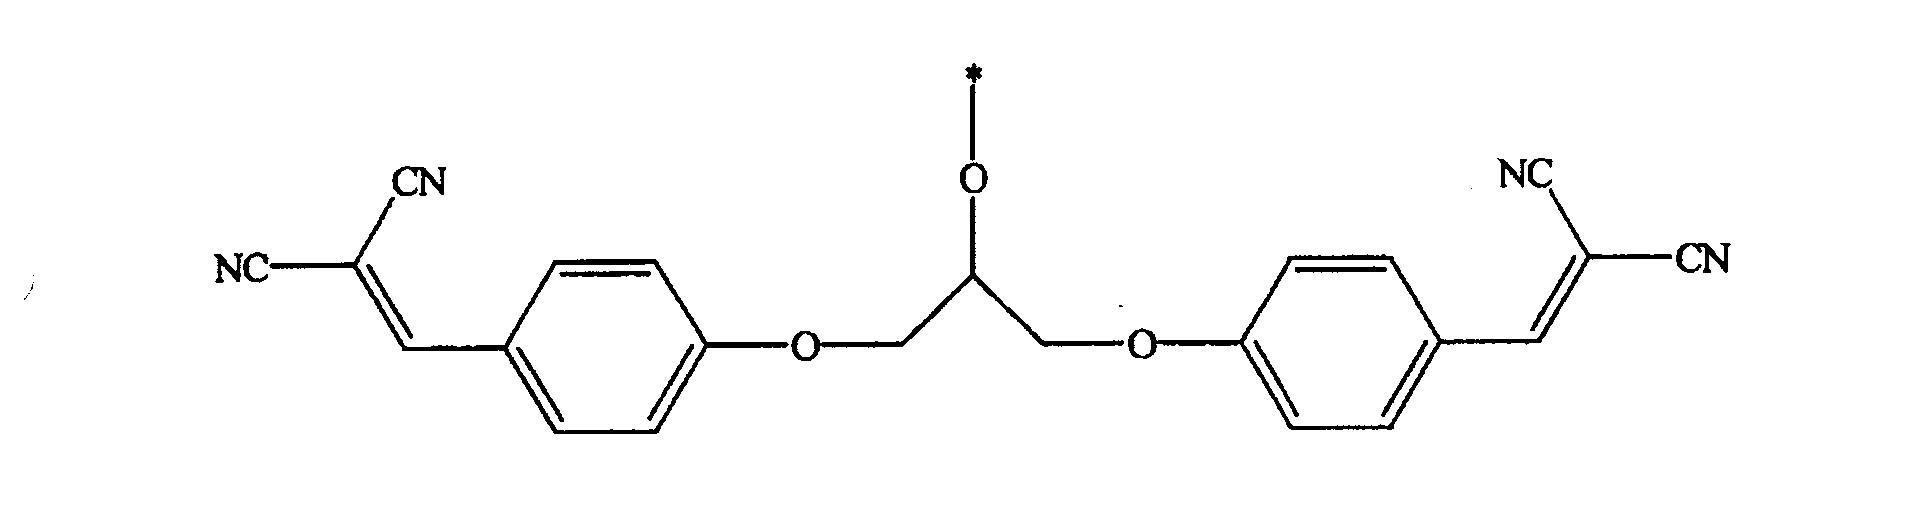 Figure 712011001004300-pct00060